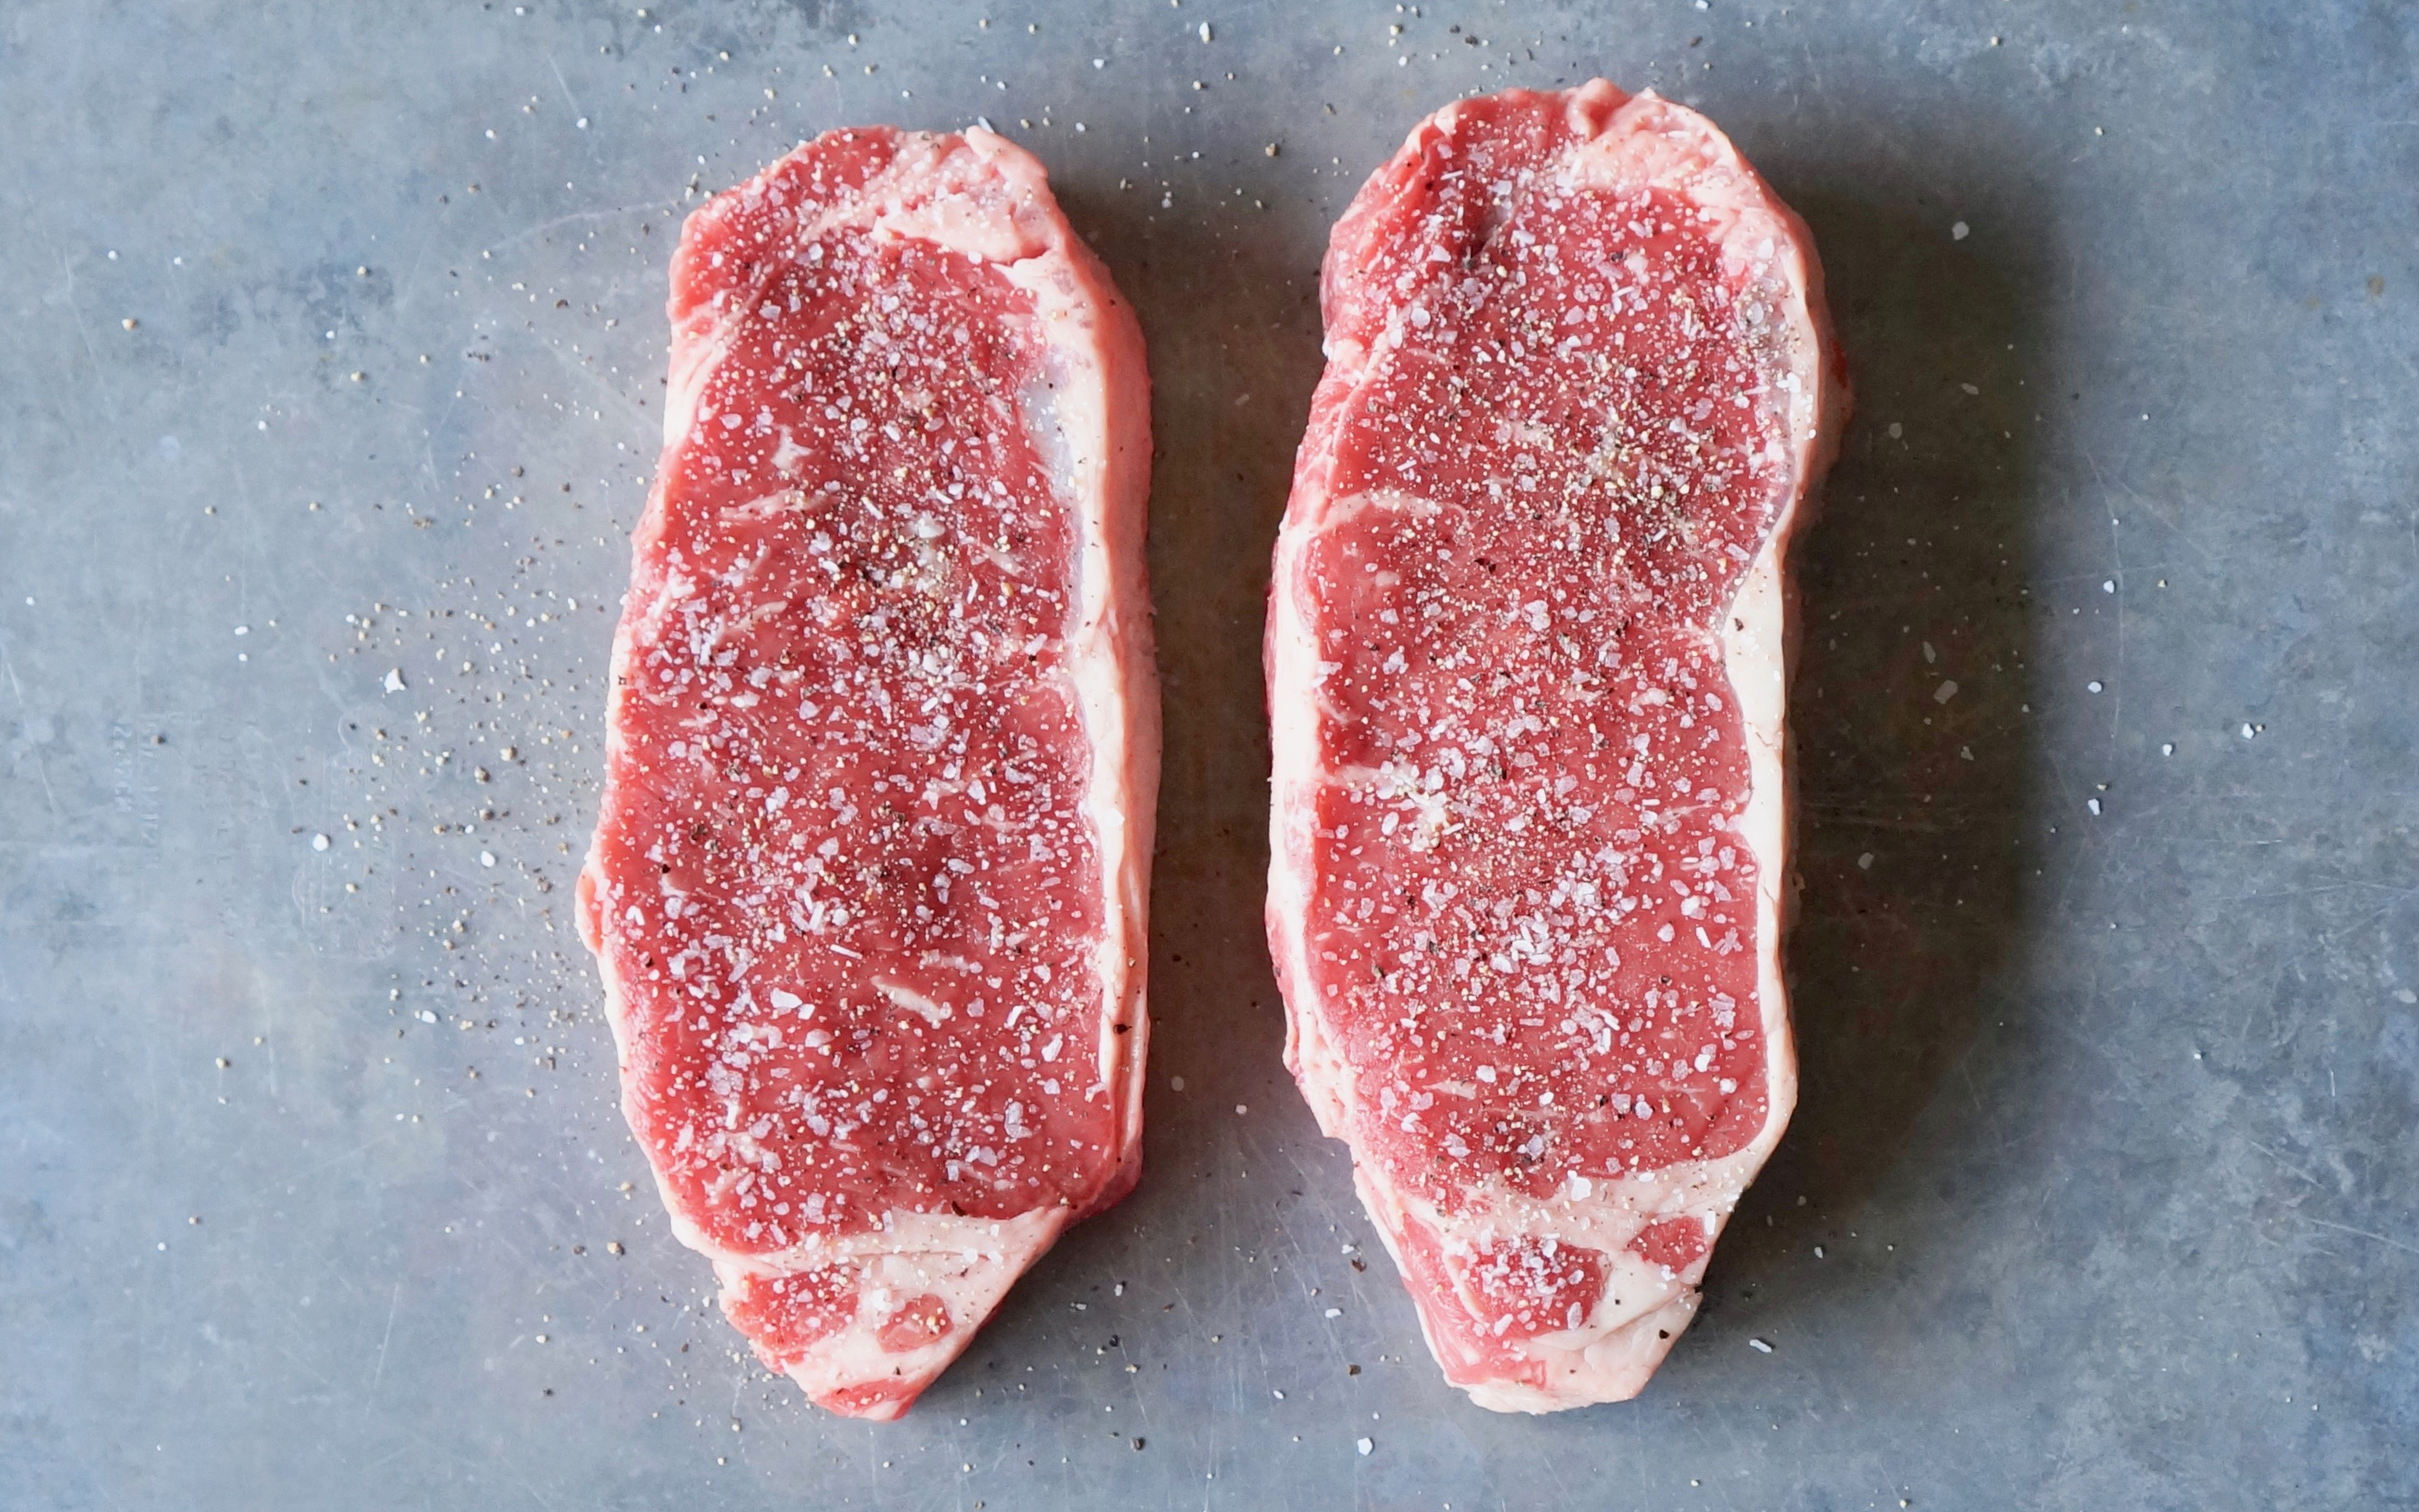 New York Strip Sreak-Rebecca-Gordon-Publisher-Buttermilk-Lipstick-Culinary Entertaining-Techniques-Top-Lion-Steak-RebeccaGordon-Southern-Hostess-Pastry-Chef-Birmingham-Alabama